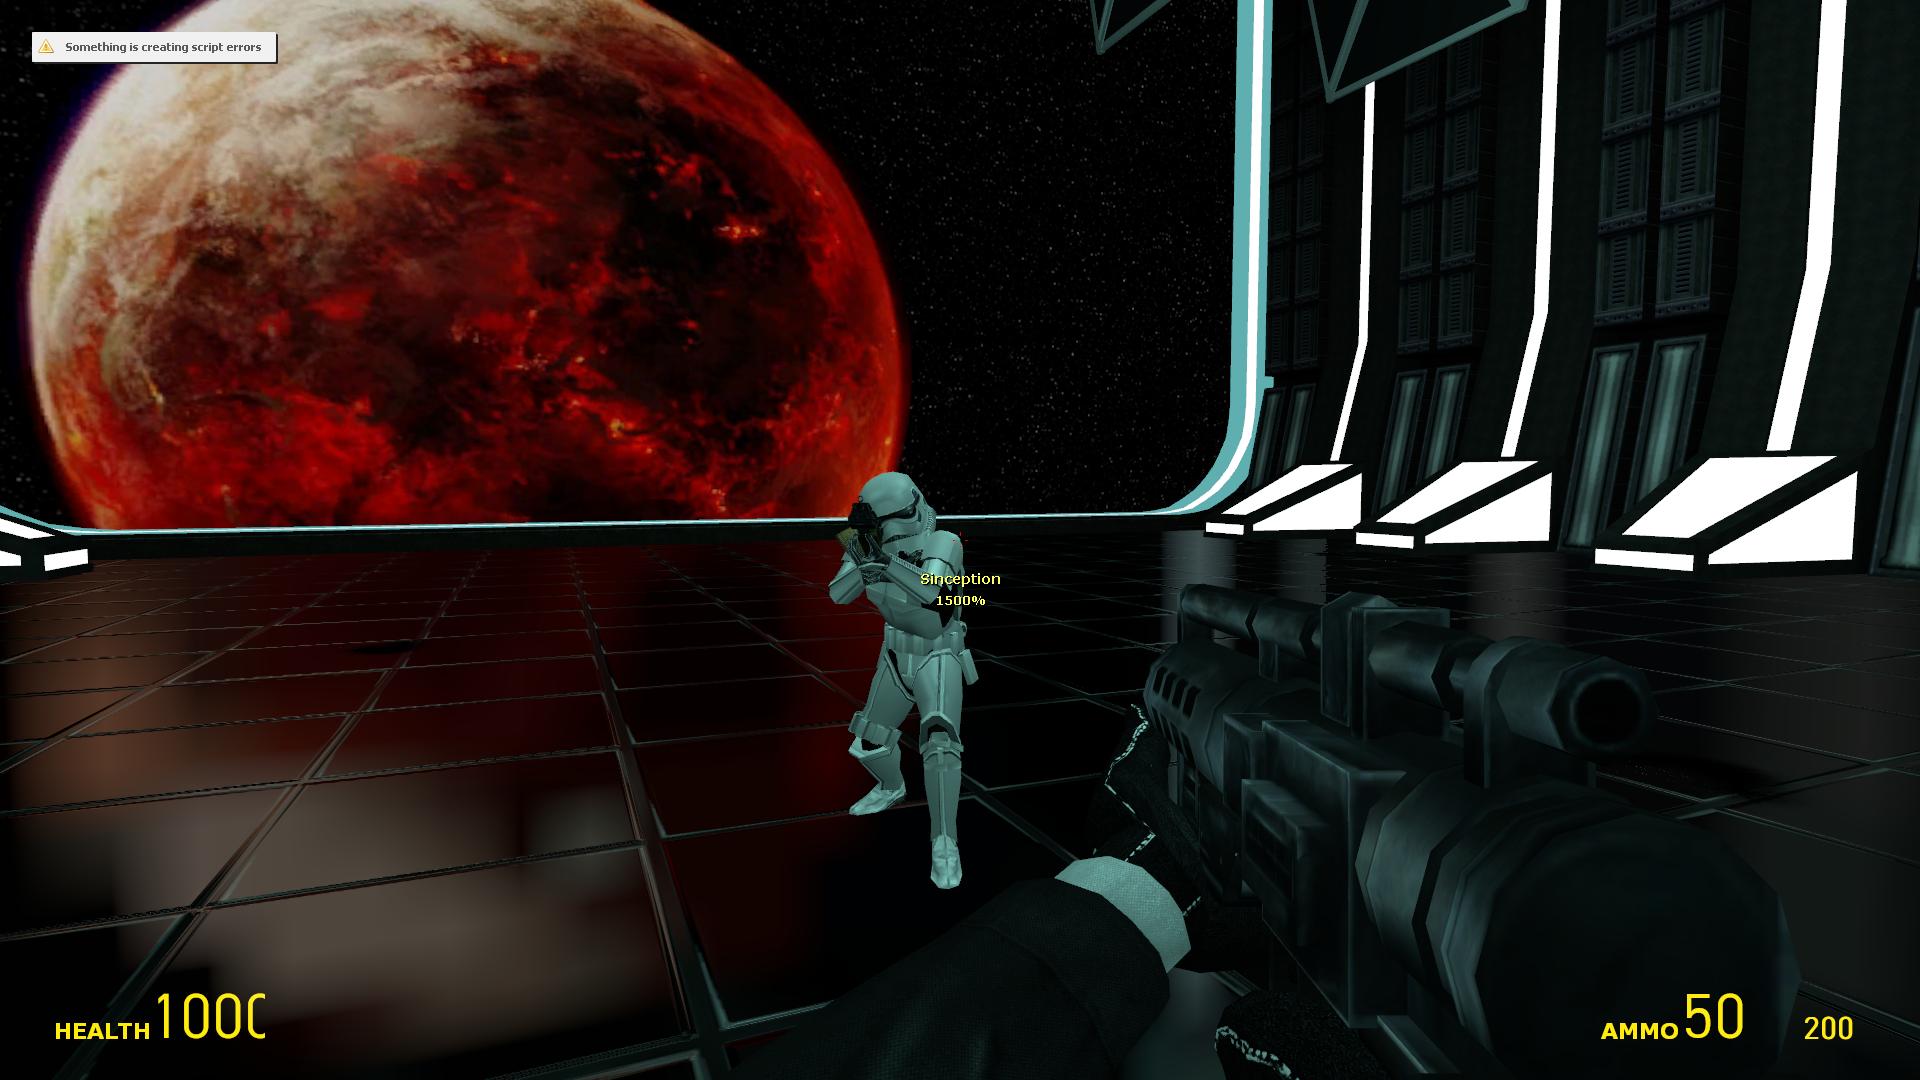 Alpha test - Ship image - Starwars Trikas mod for Garry's